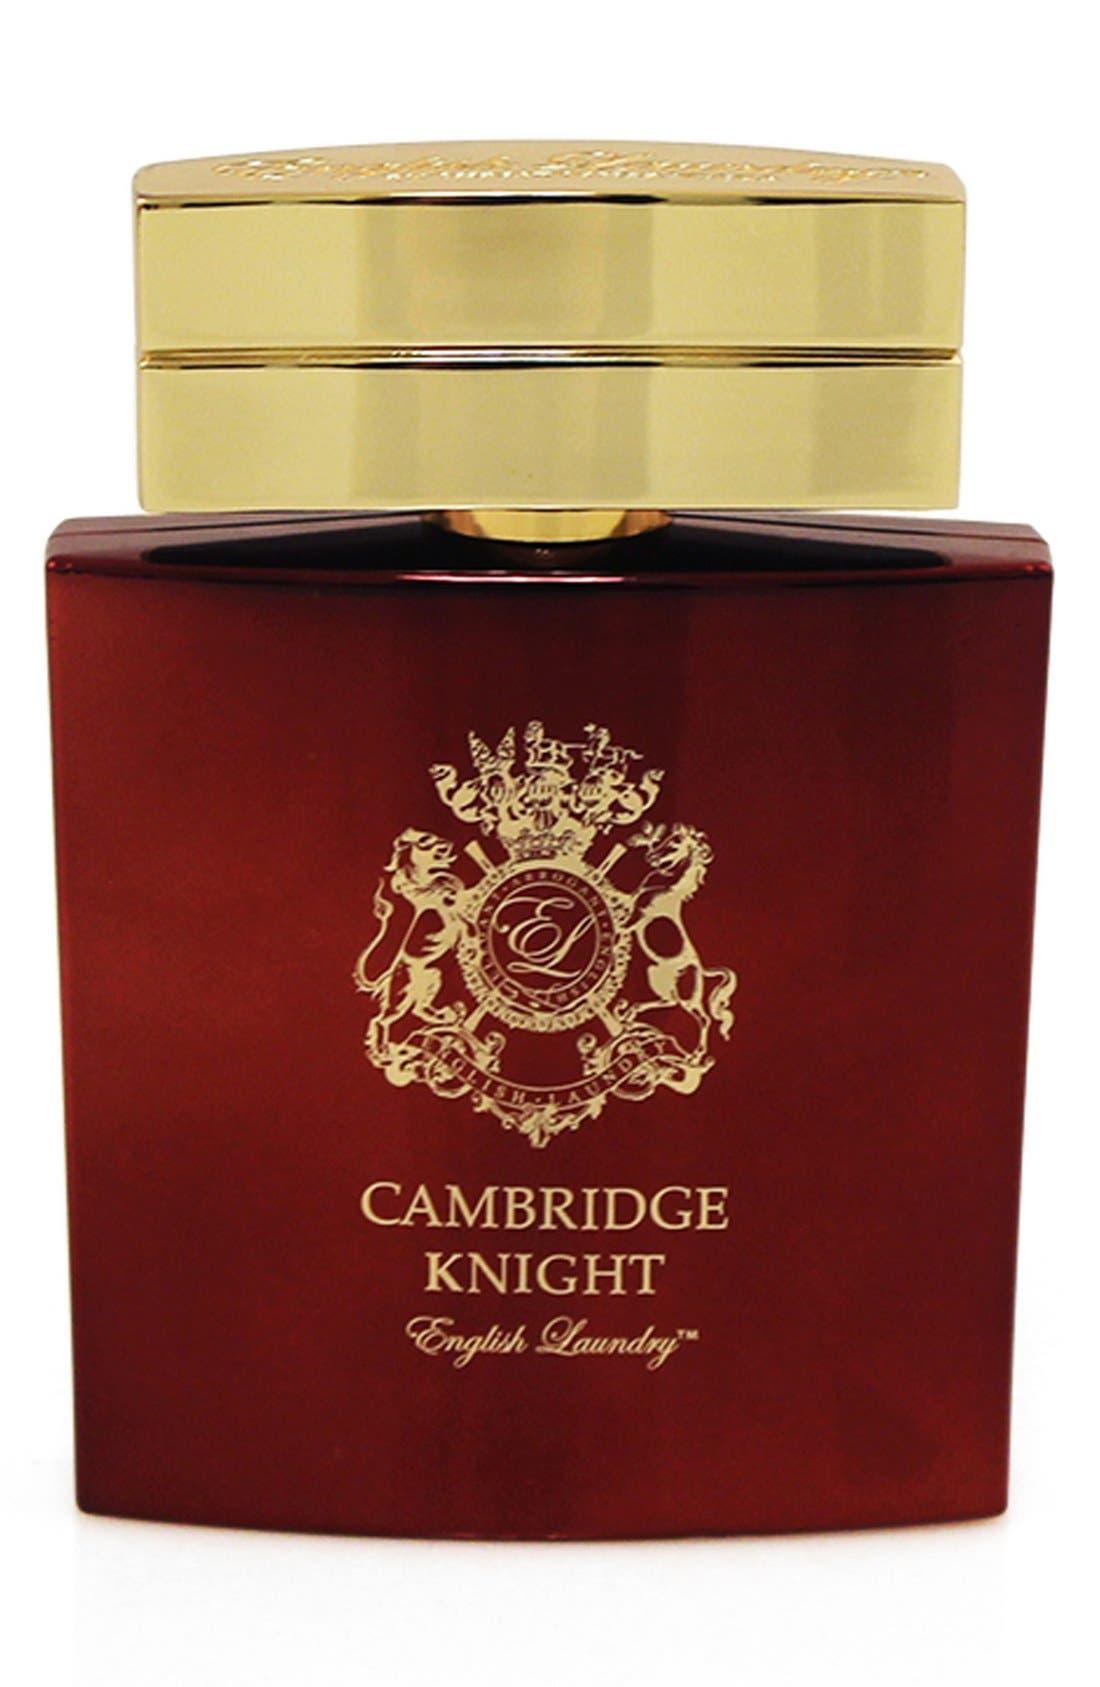 'Cambridge Knight' Eau de Parfum,                         Main,                         color, 000